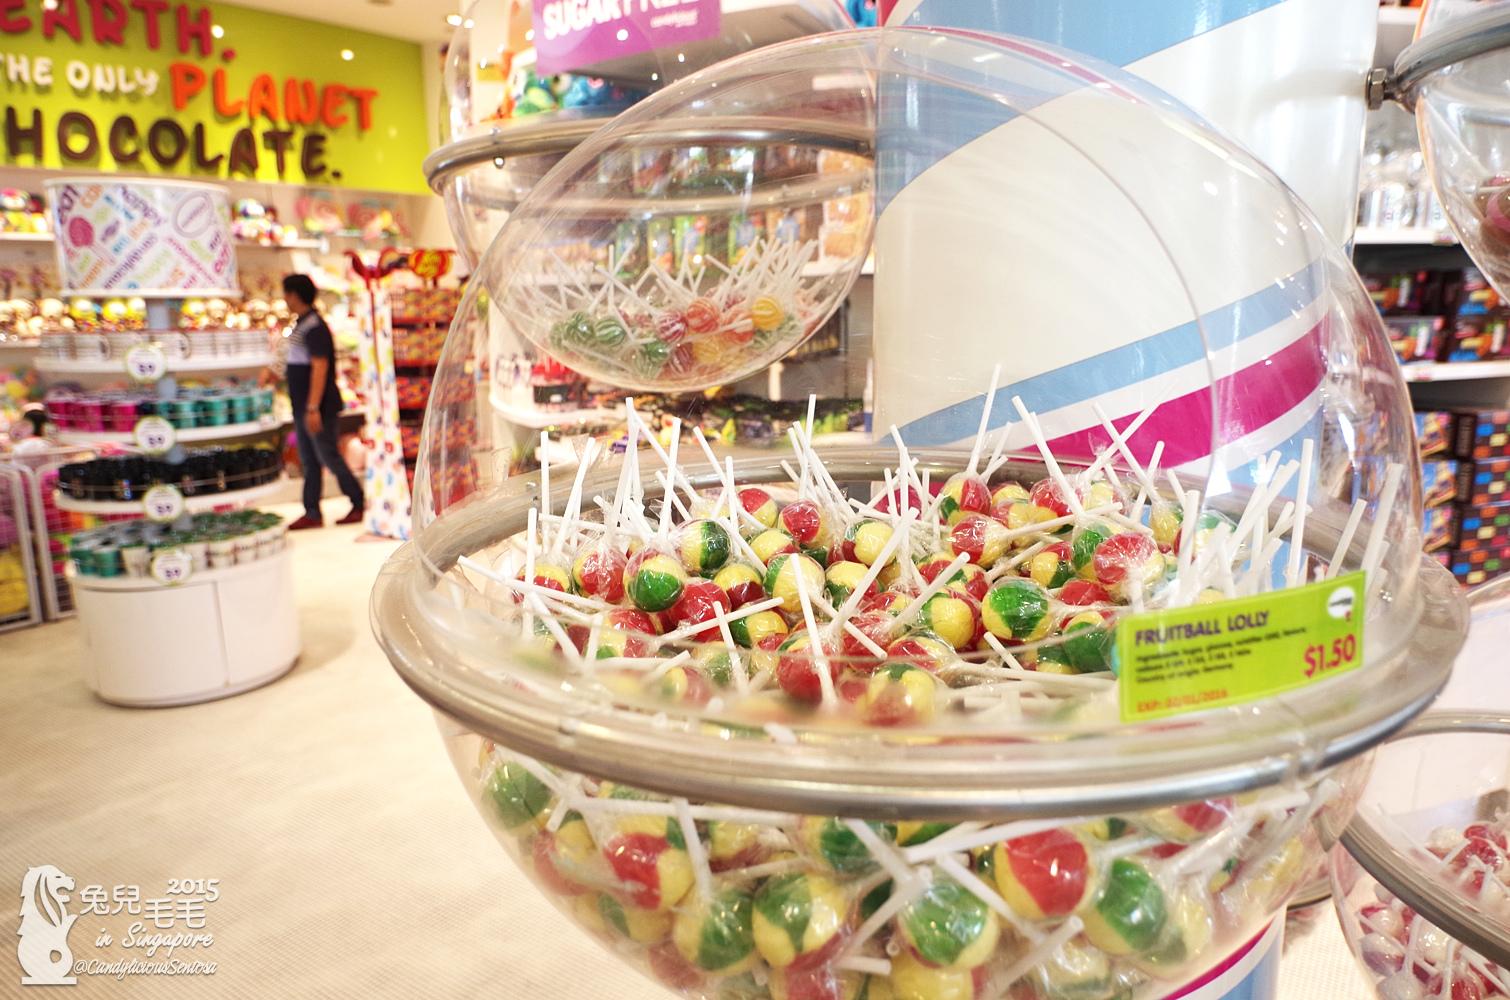 0215-Candylicious-06.jpg